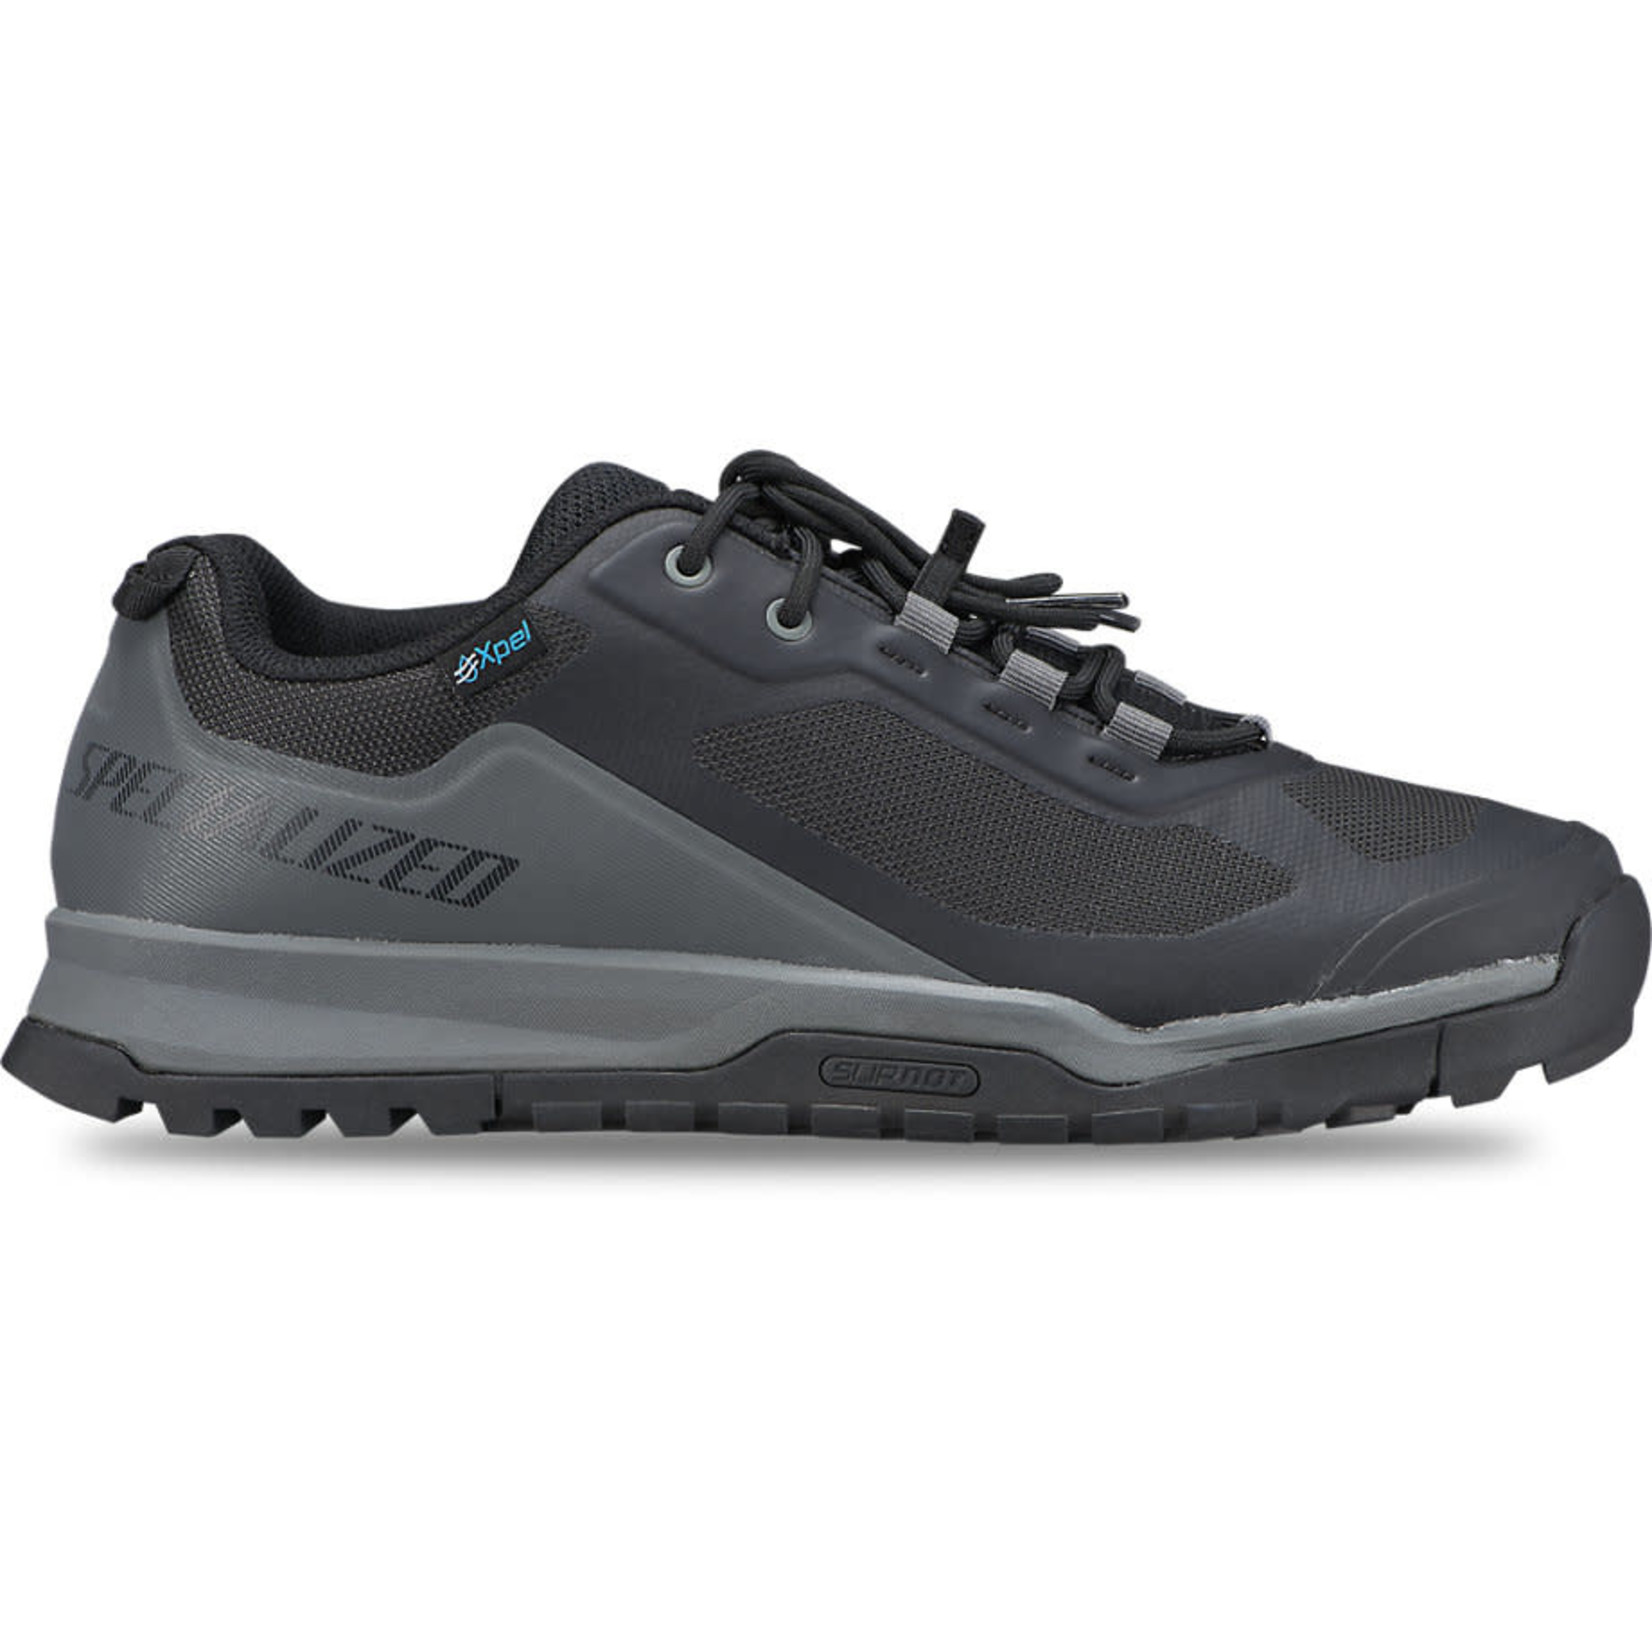 Specialized Specialized Rime Flat MTB Shoe